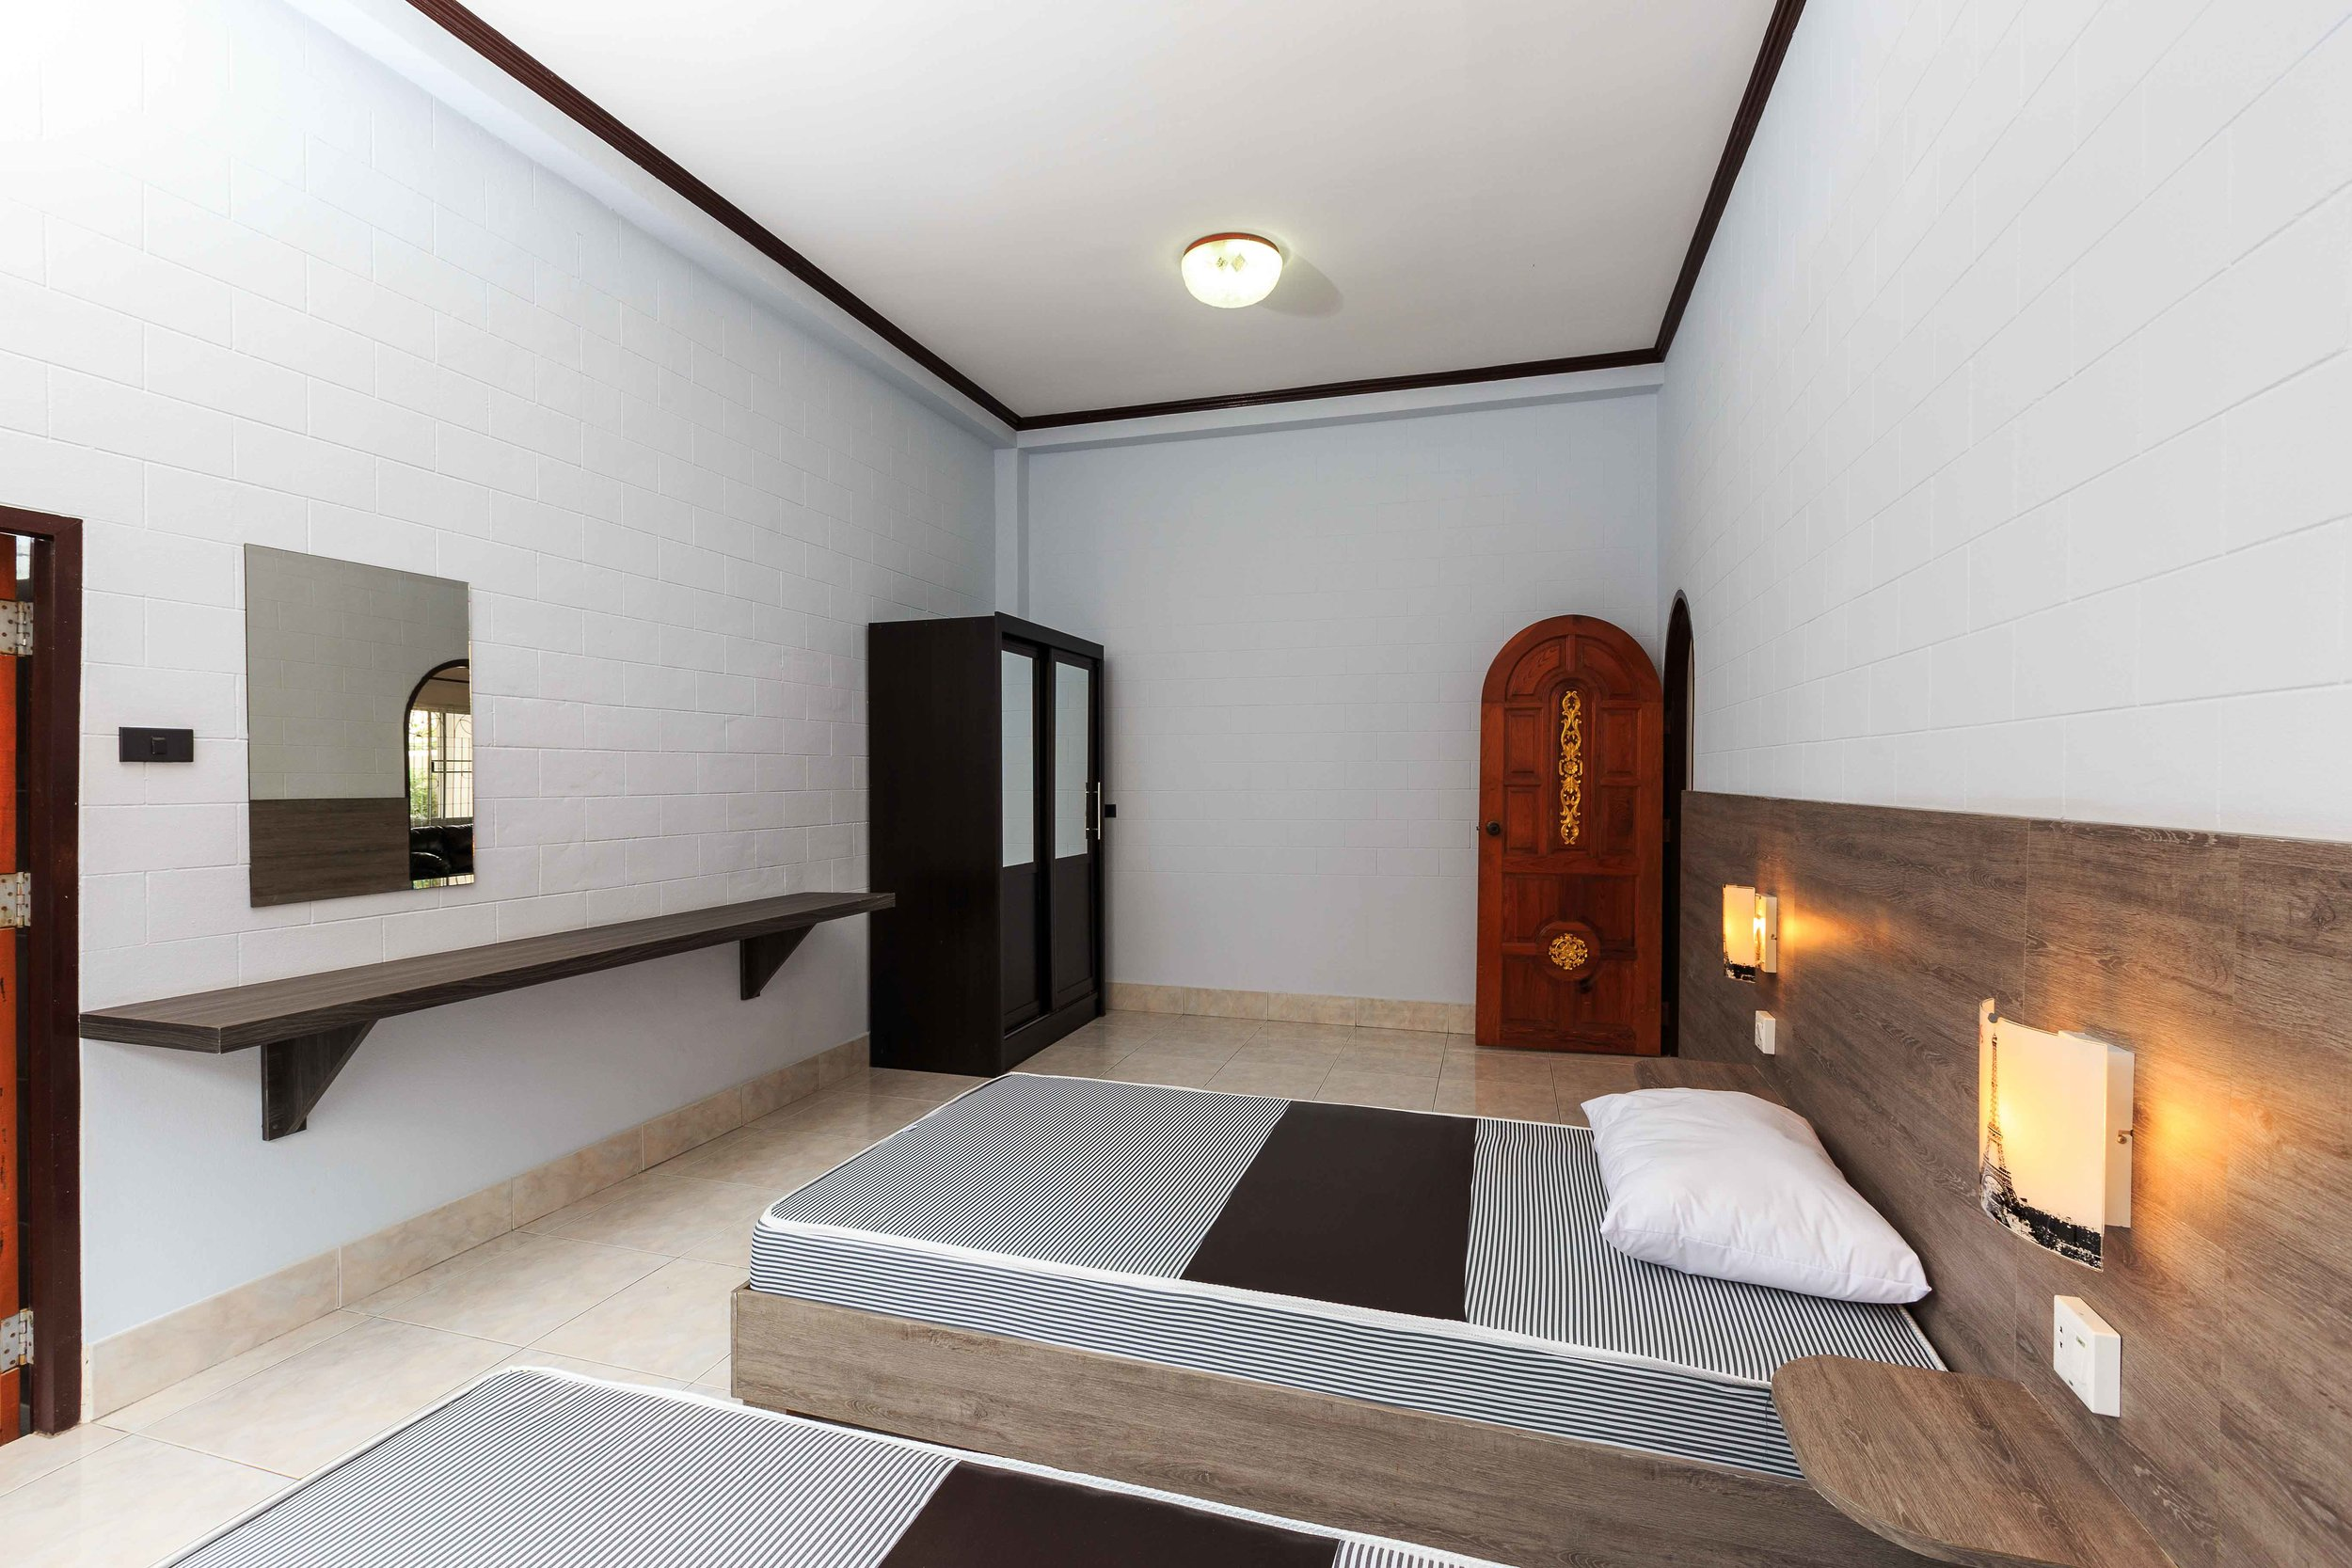 Room02-03.jpg